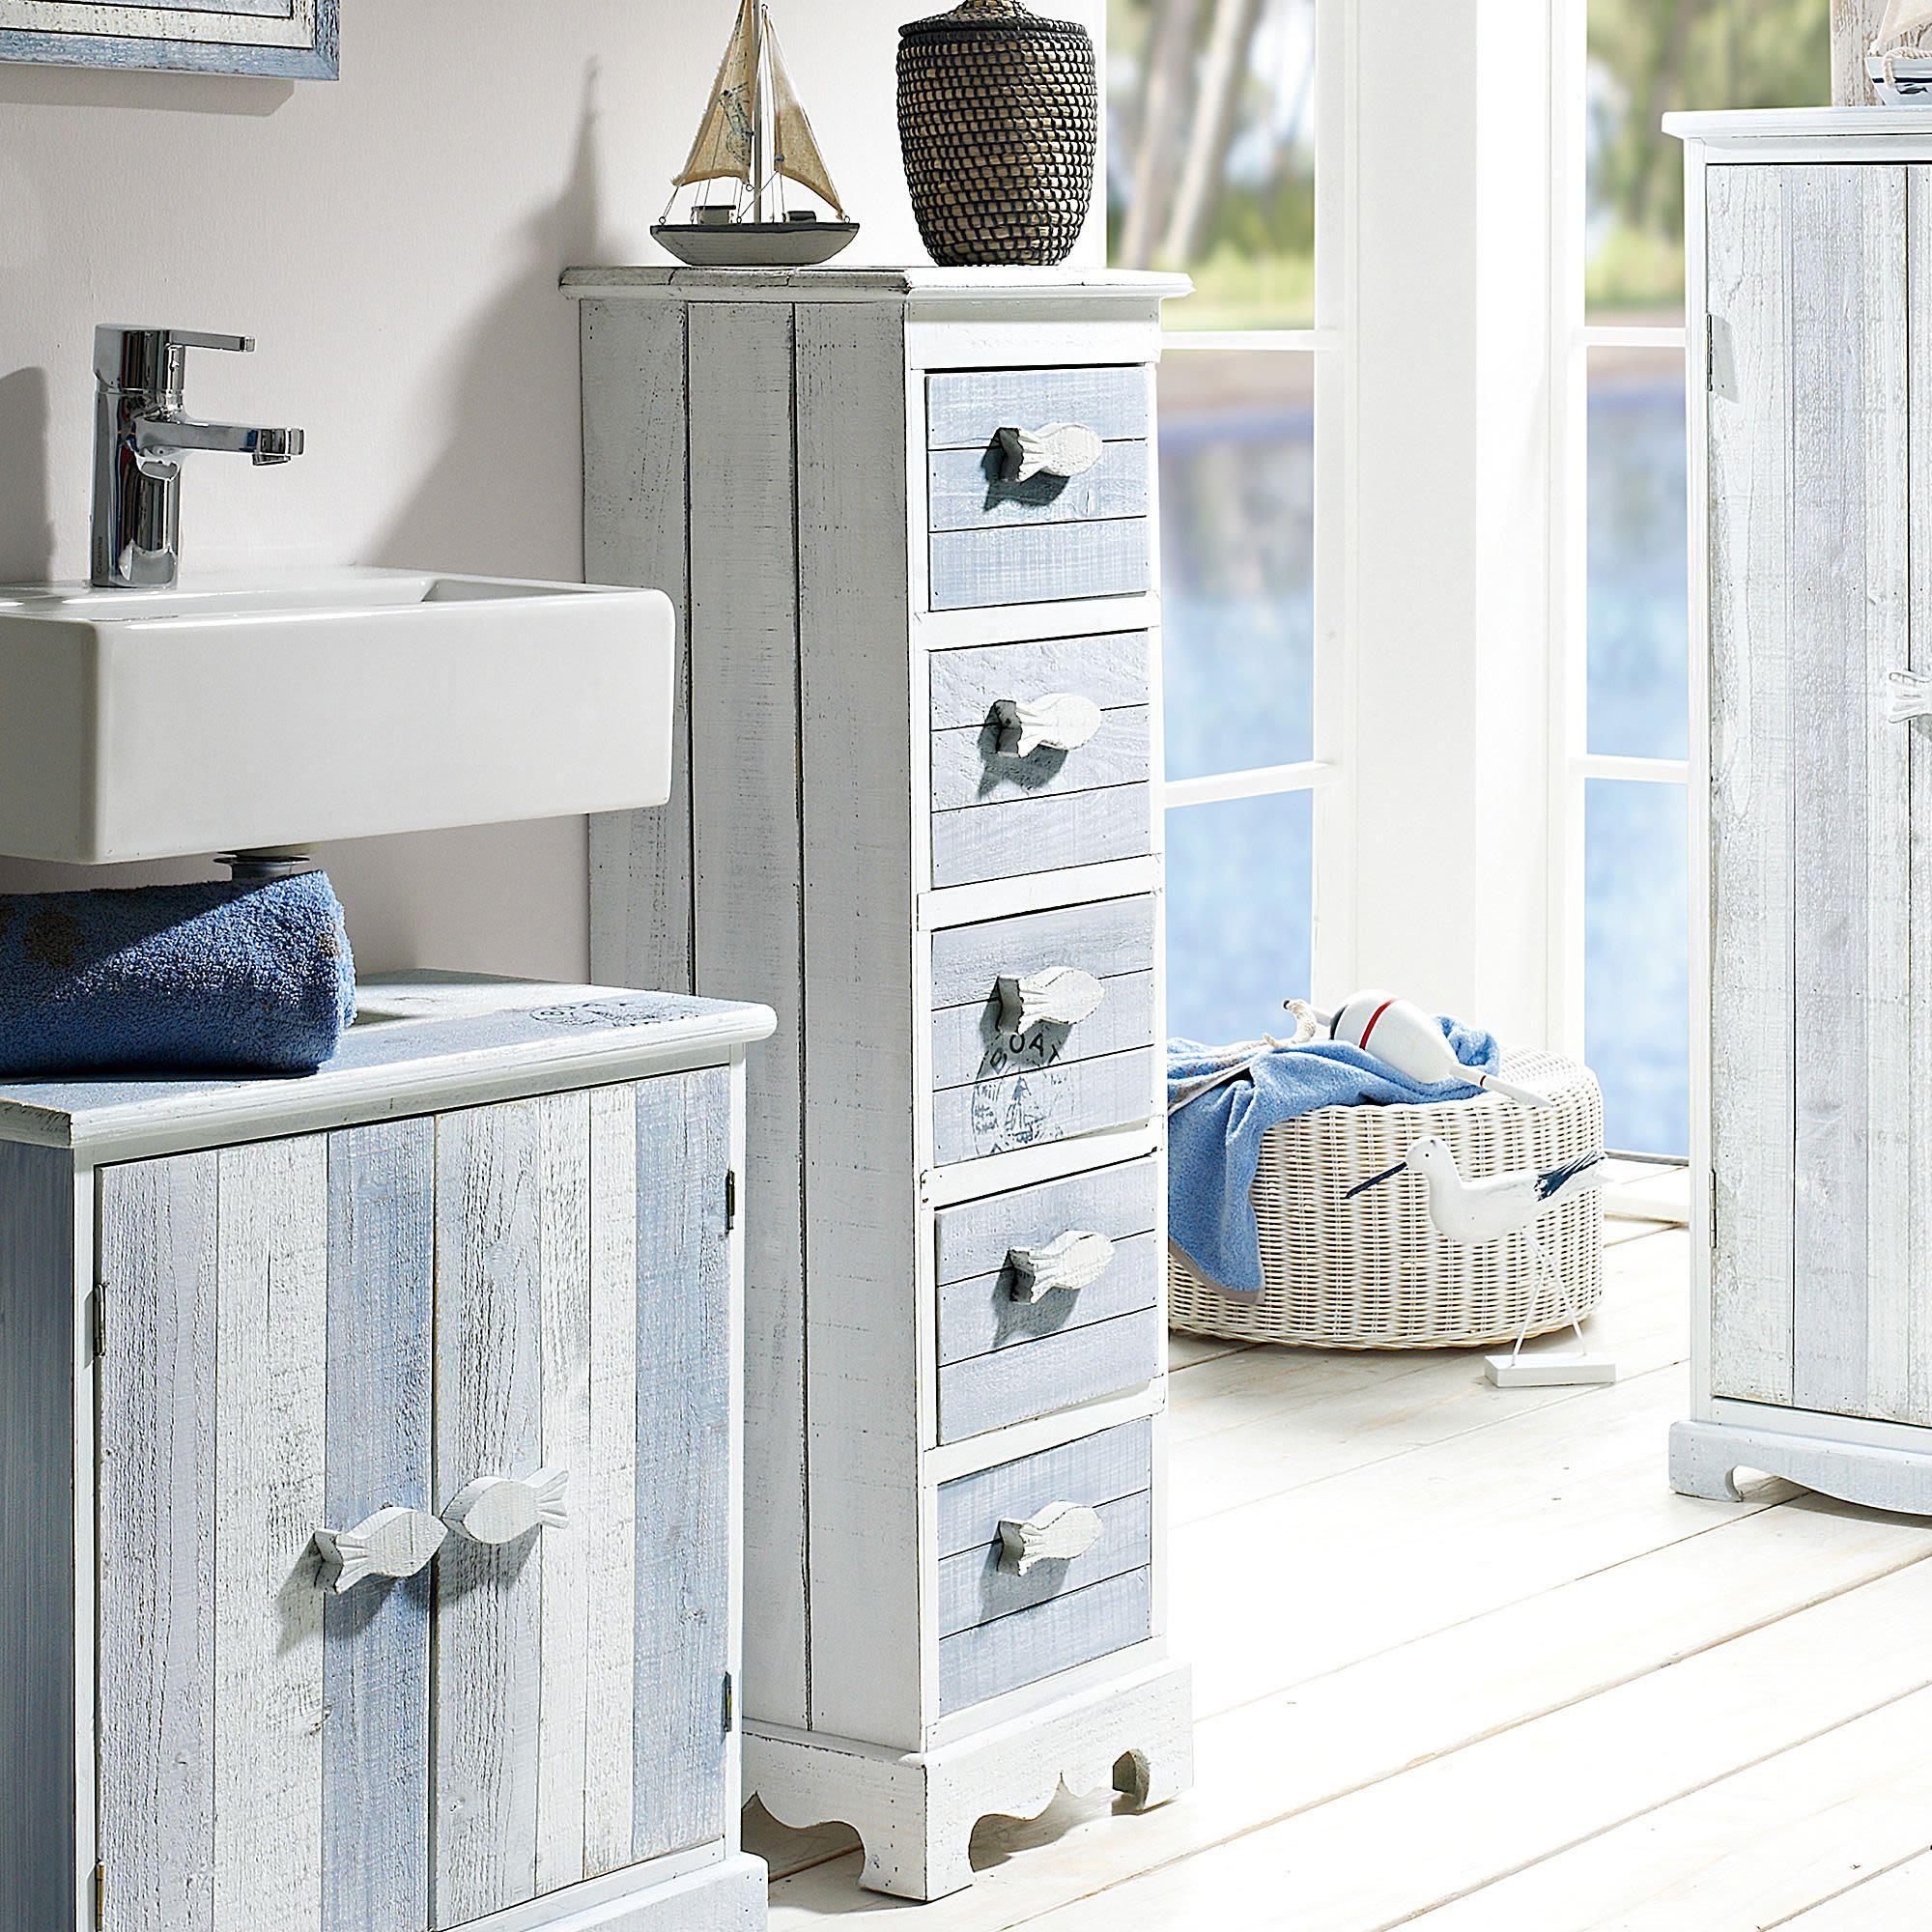 kommode hanse blau wei maritim badset badm bel badezimmer. Black Bedroom Furniture Sets. Home Design Ideas